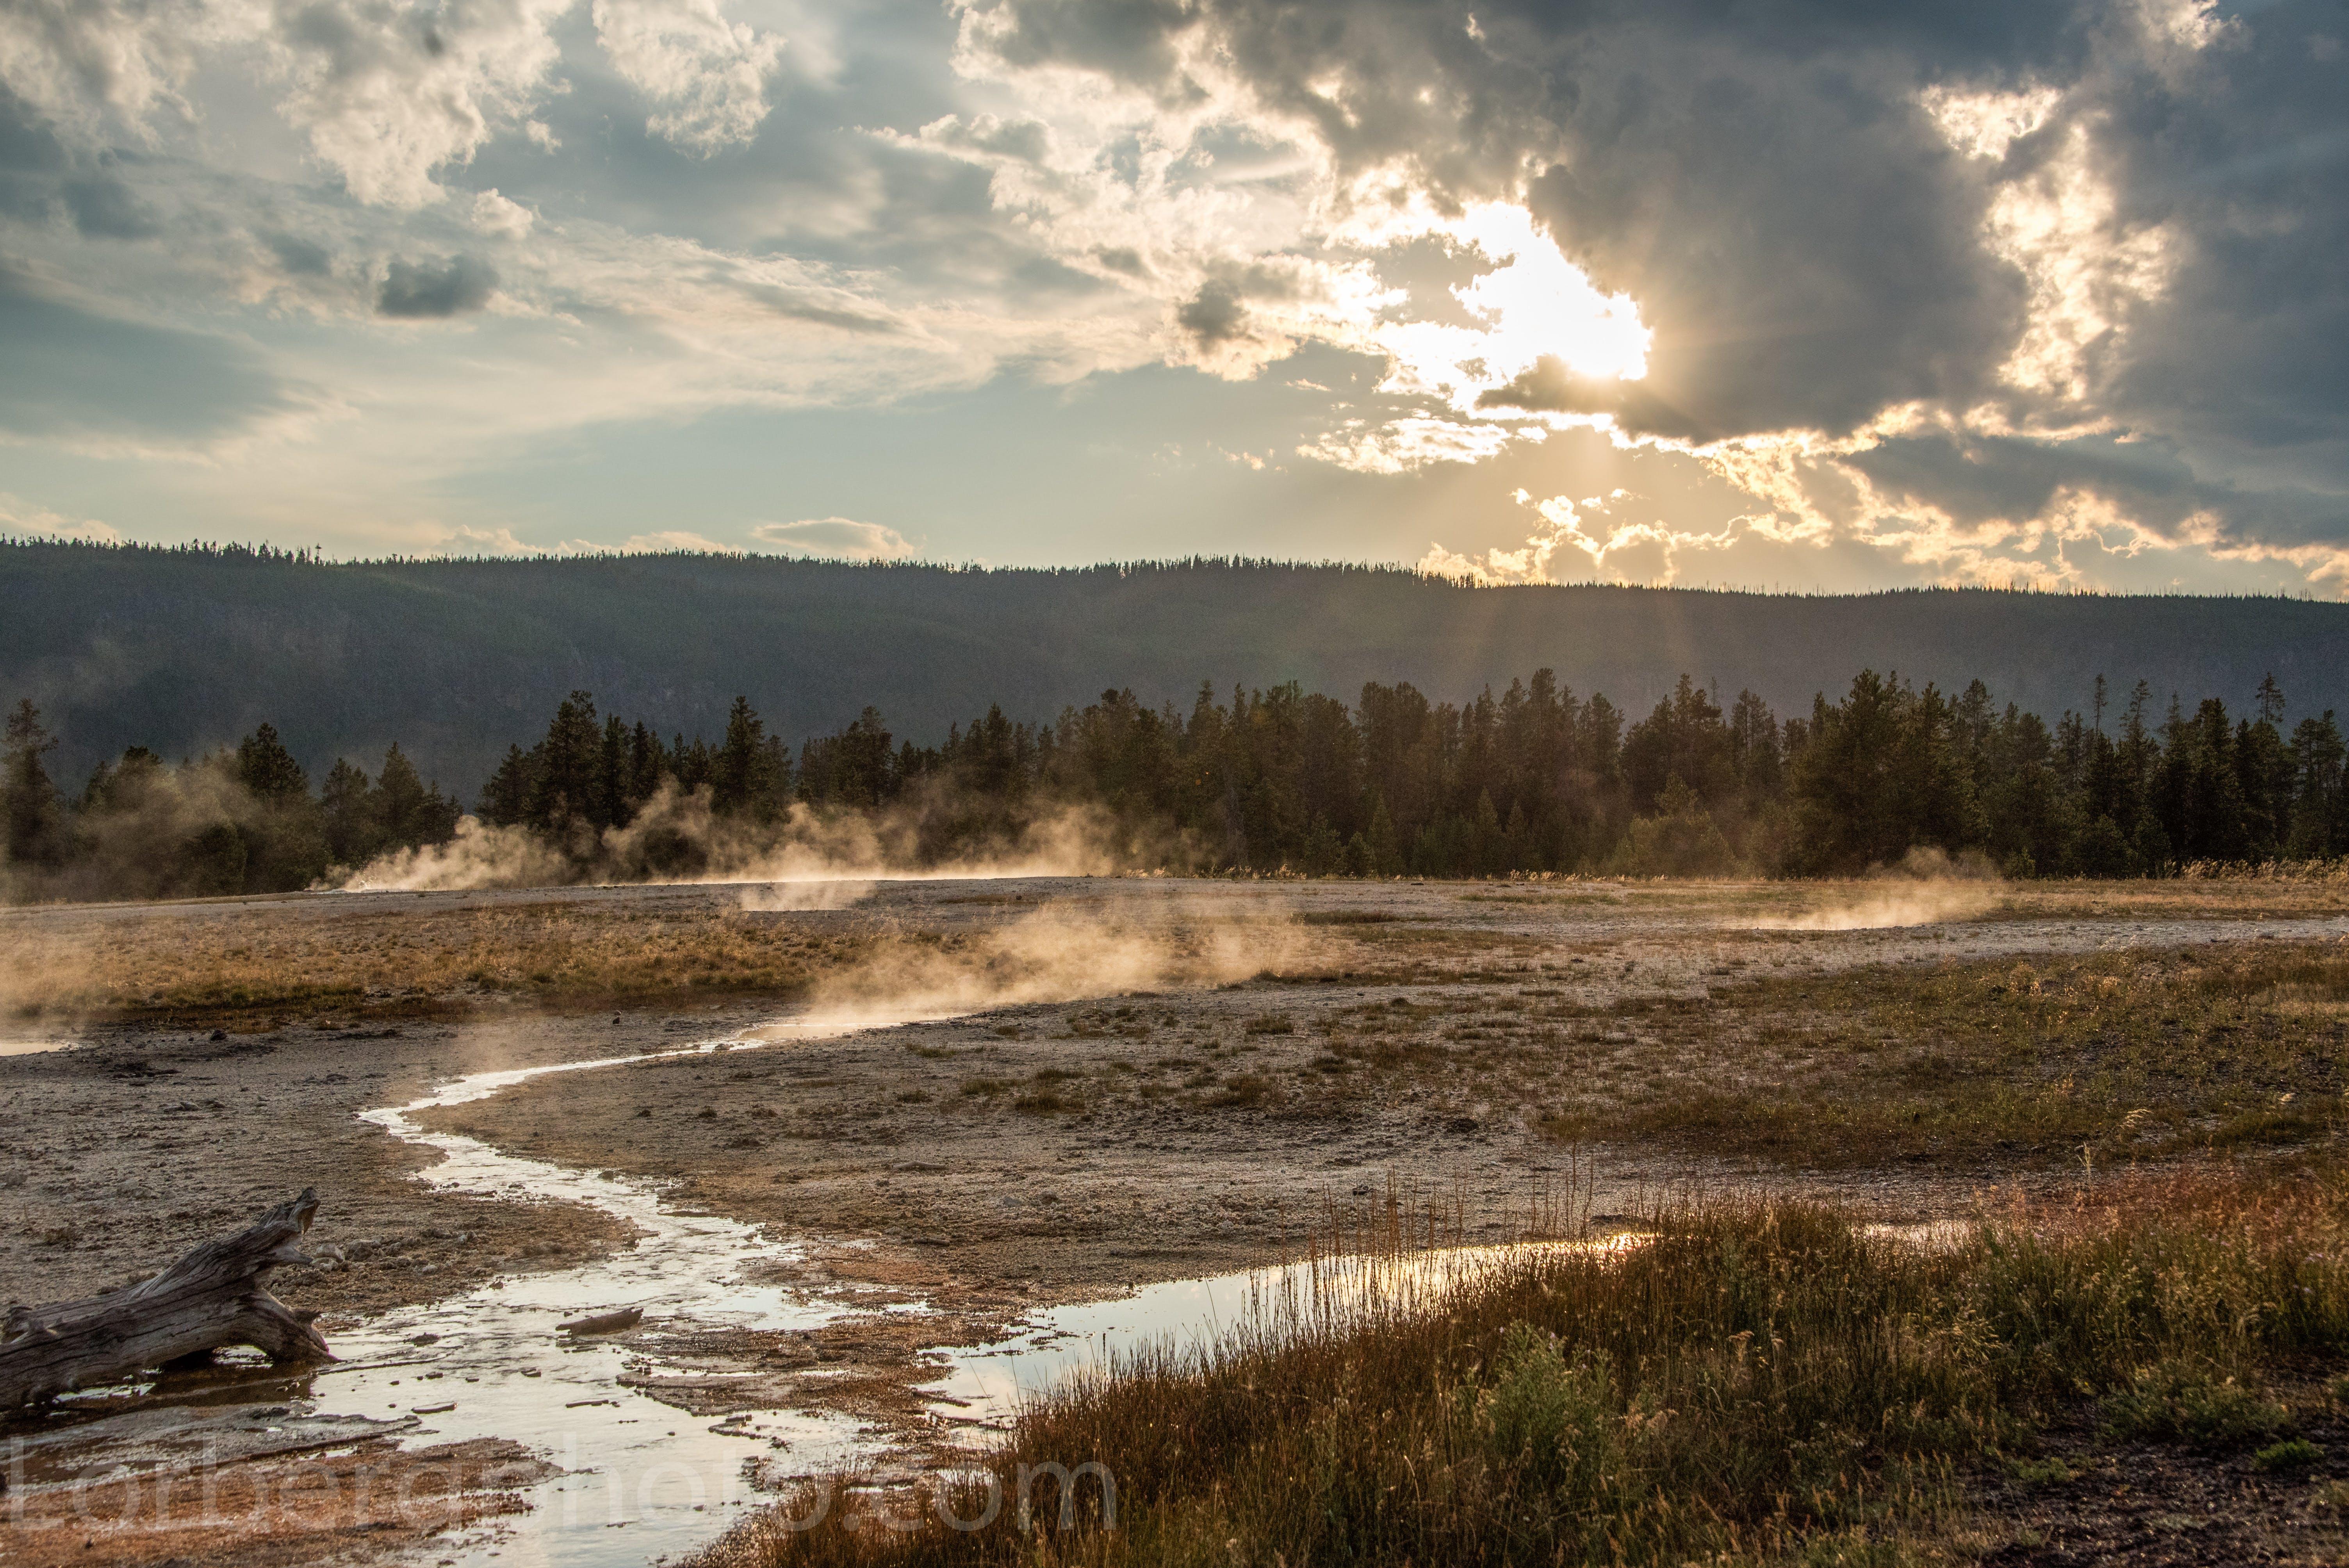 Free stock photo of yellowstone national park